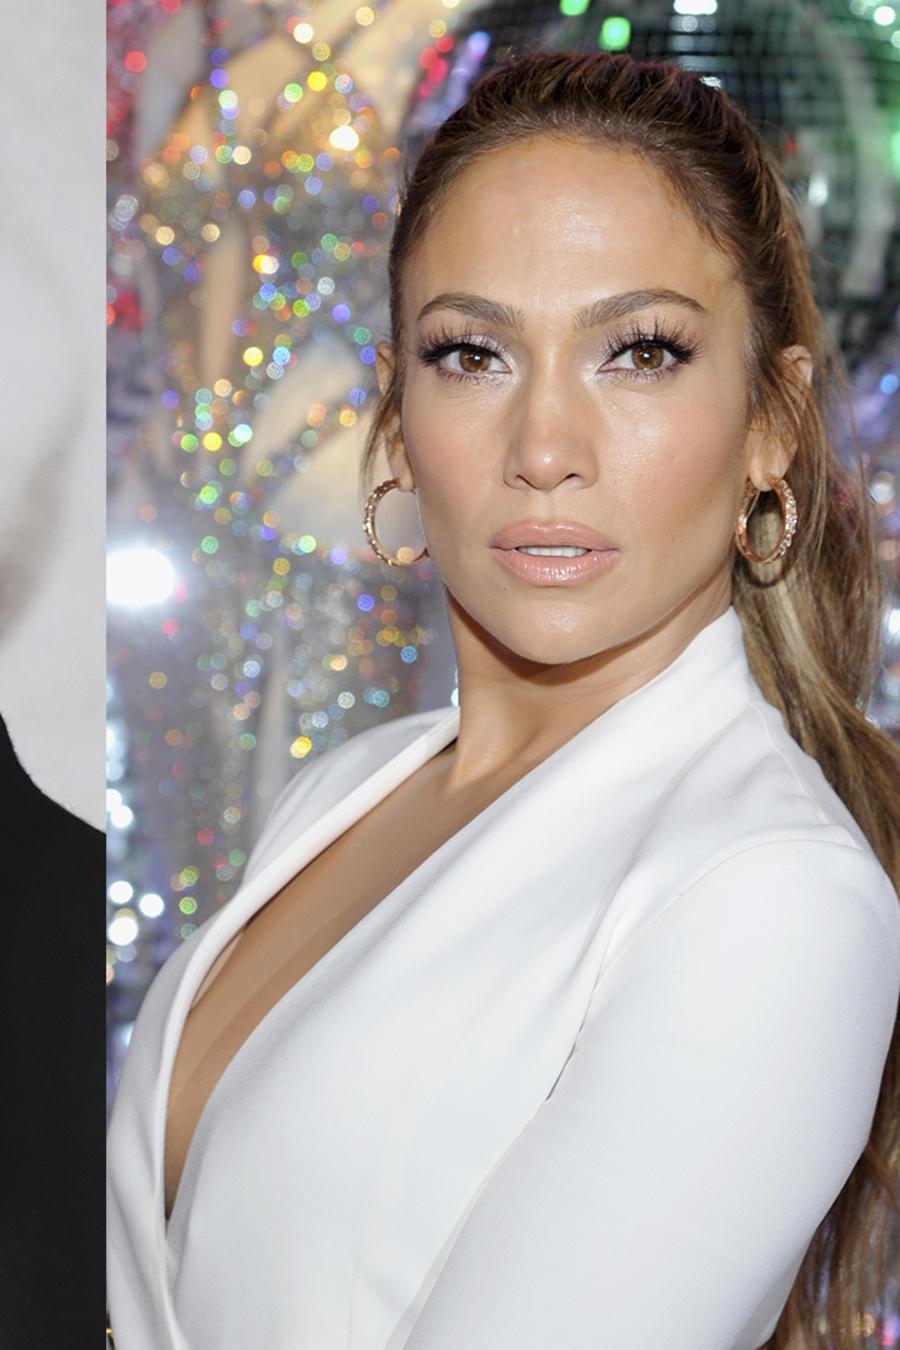 Collage de fotos de Salma Hayek, Brad Pitt y Jennifer Lopez.